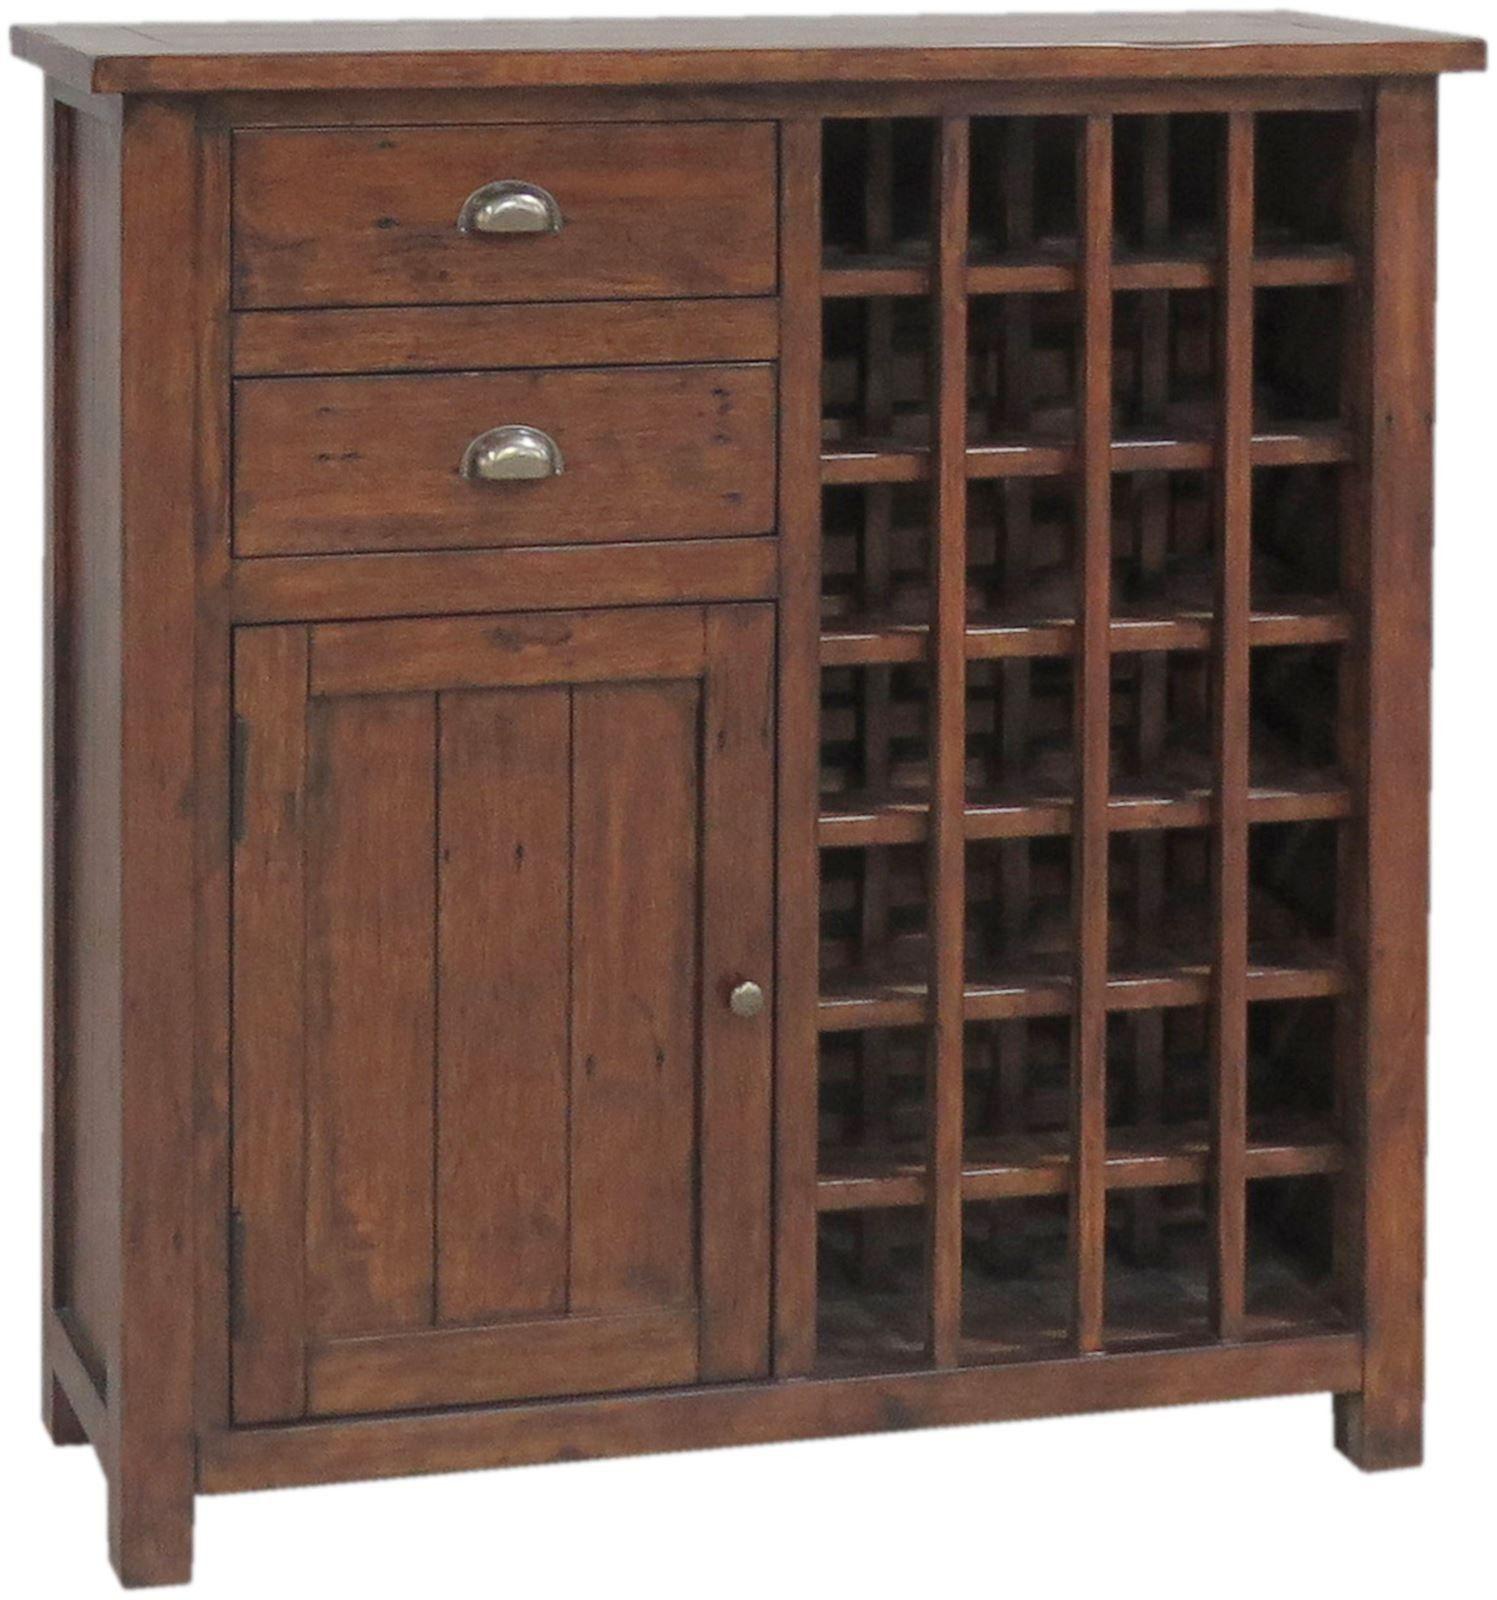 Delightful Classic Driftwood Reclaimed Pine 24 Bottle Cabinet